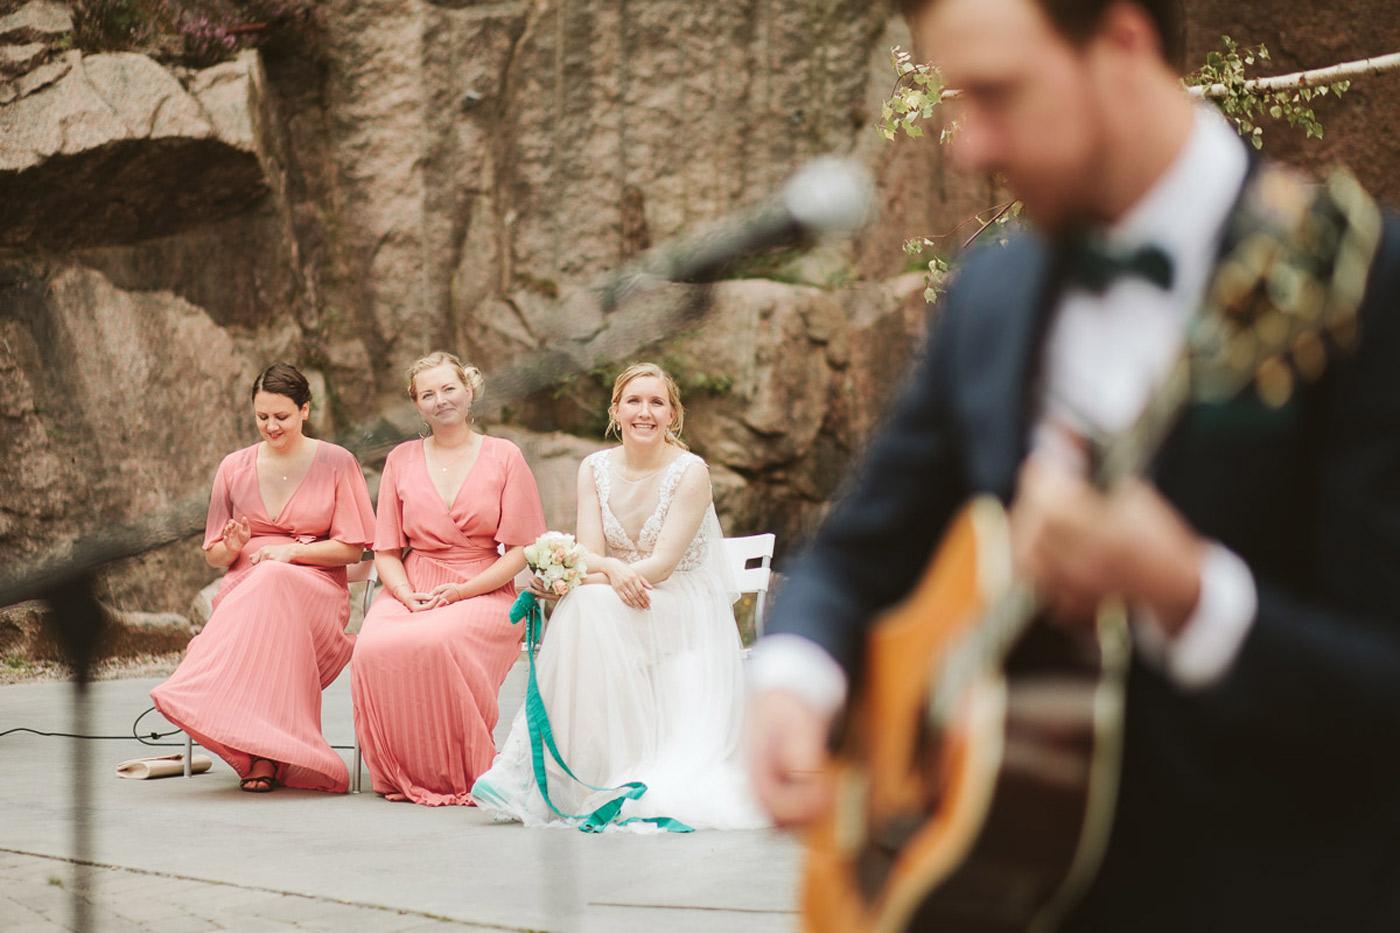 alternative wedding locations in norway